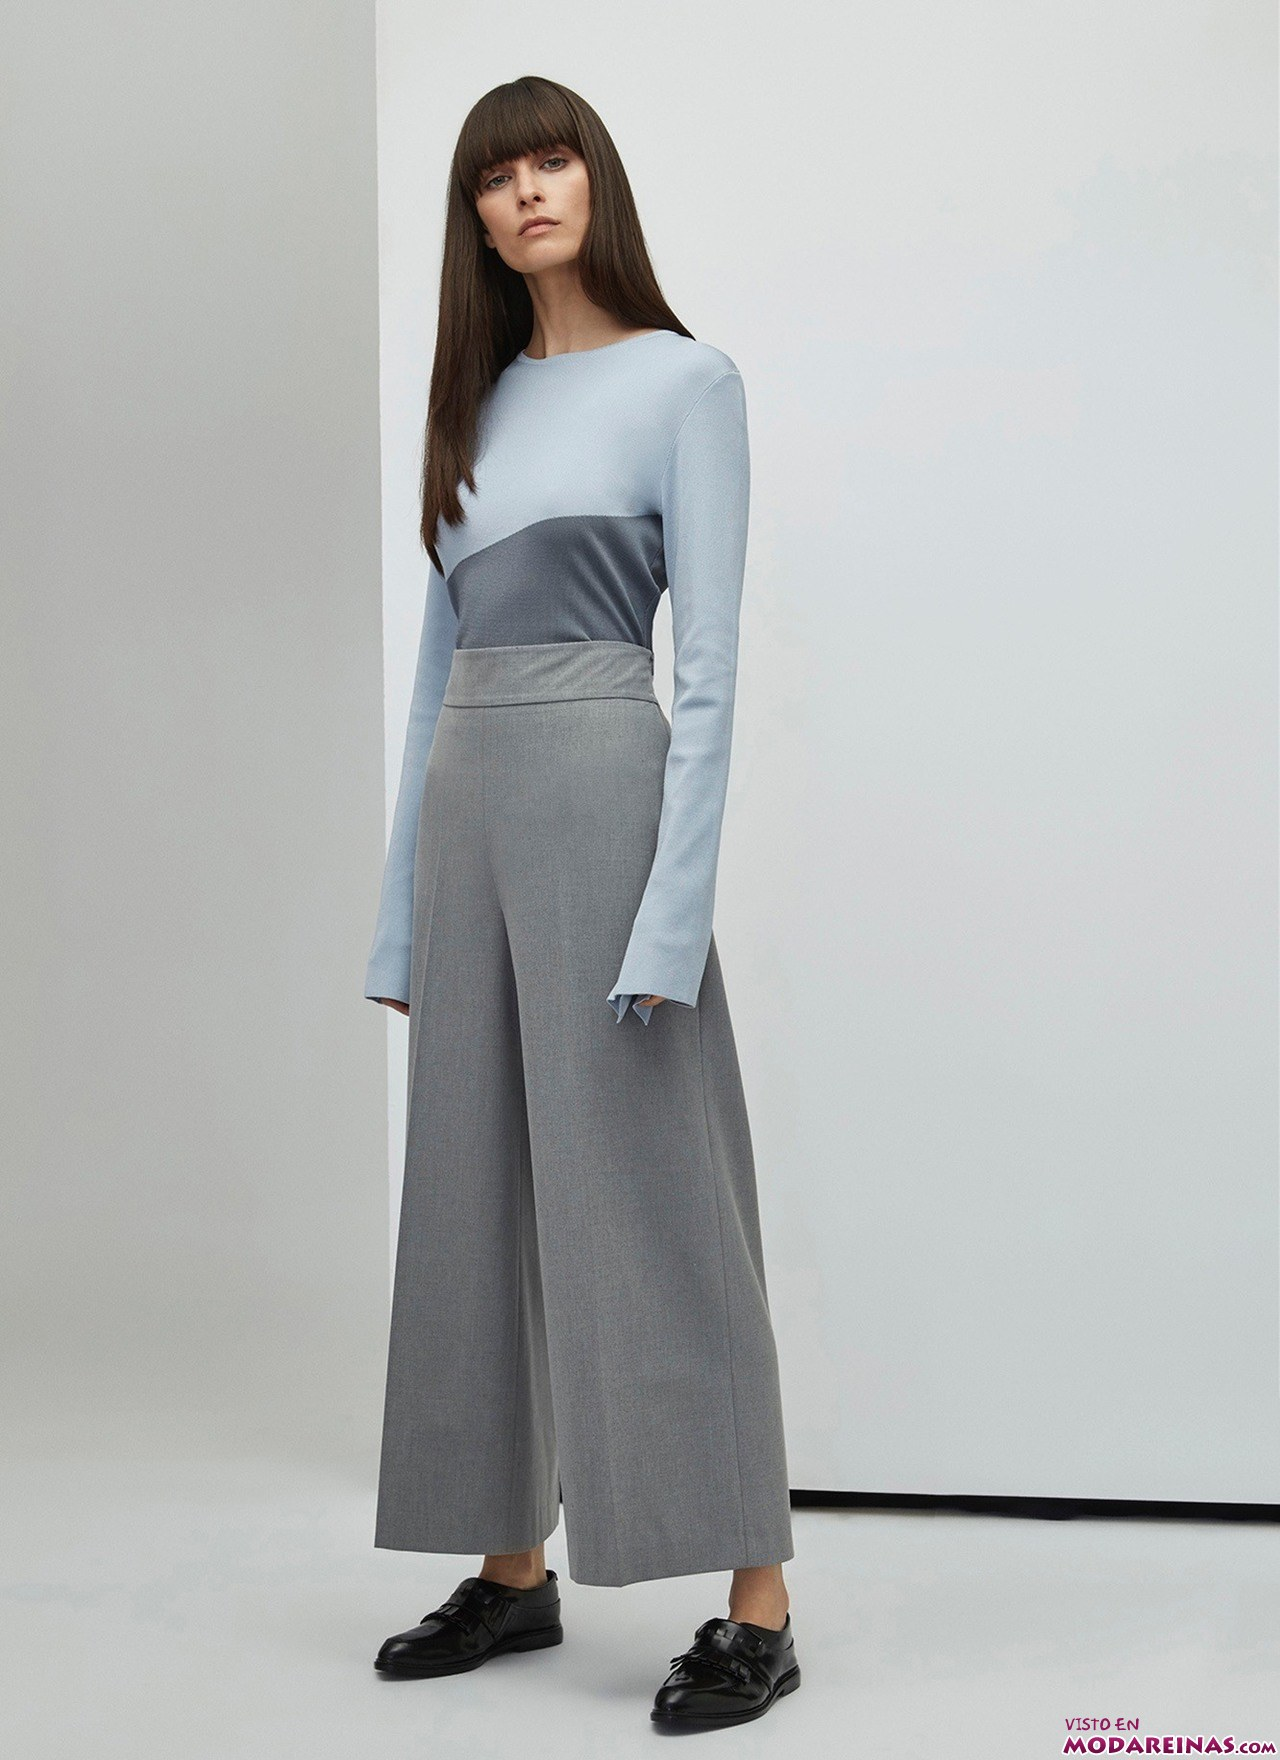 pantalón culotte adolfo domínguez